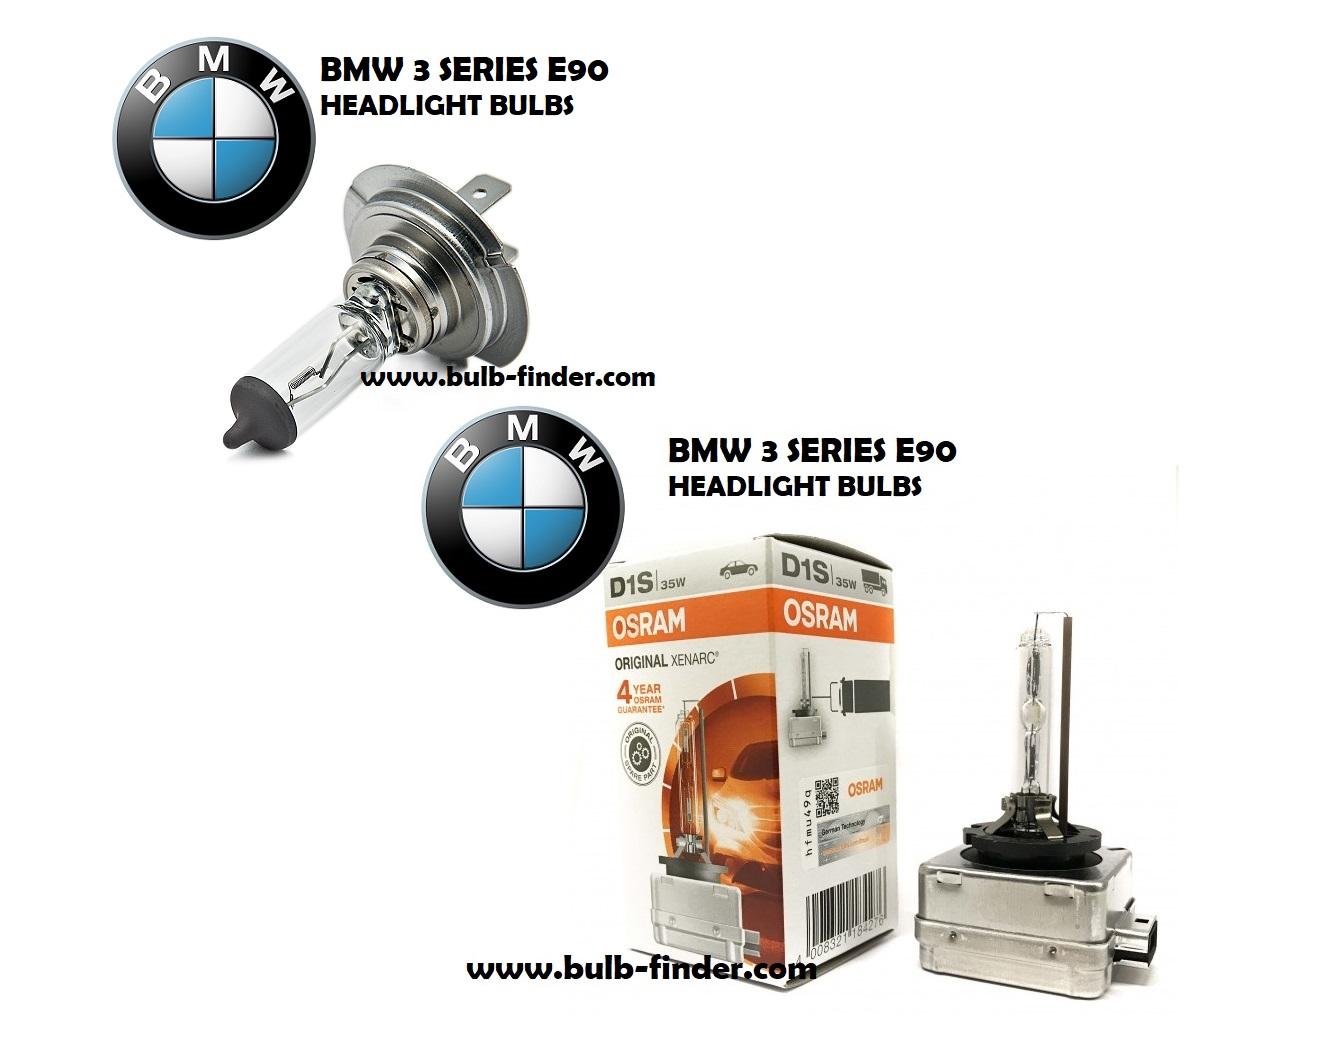 BMW 3 Series E91 bulbs headlight models